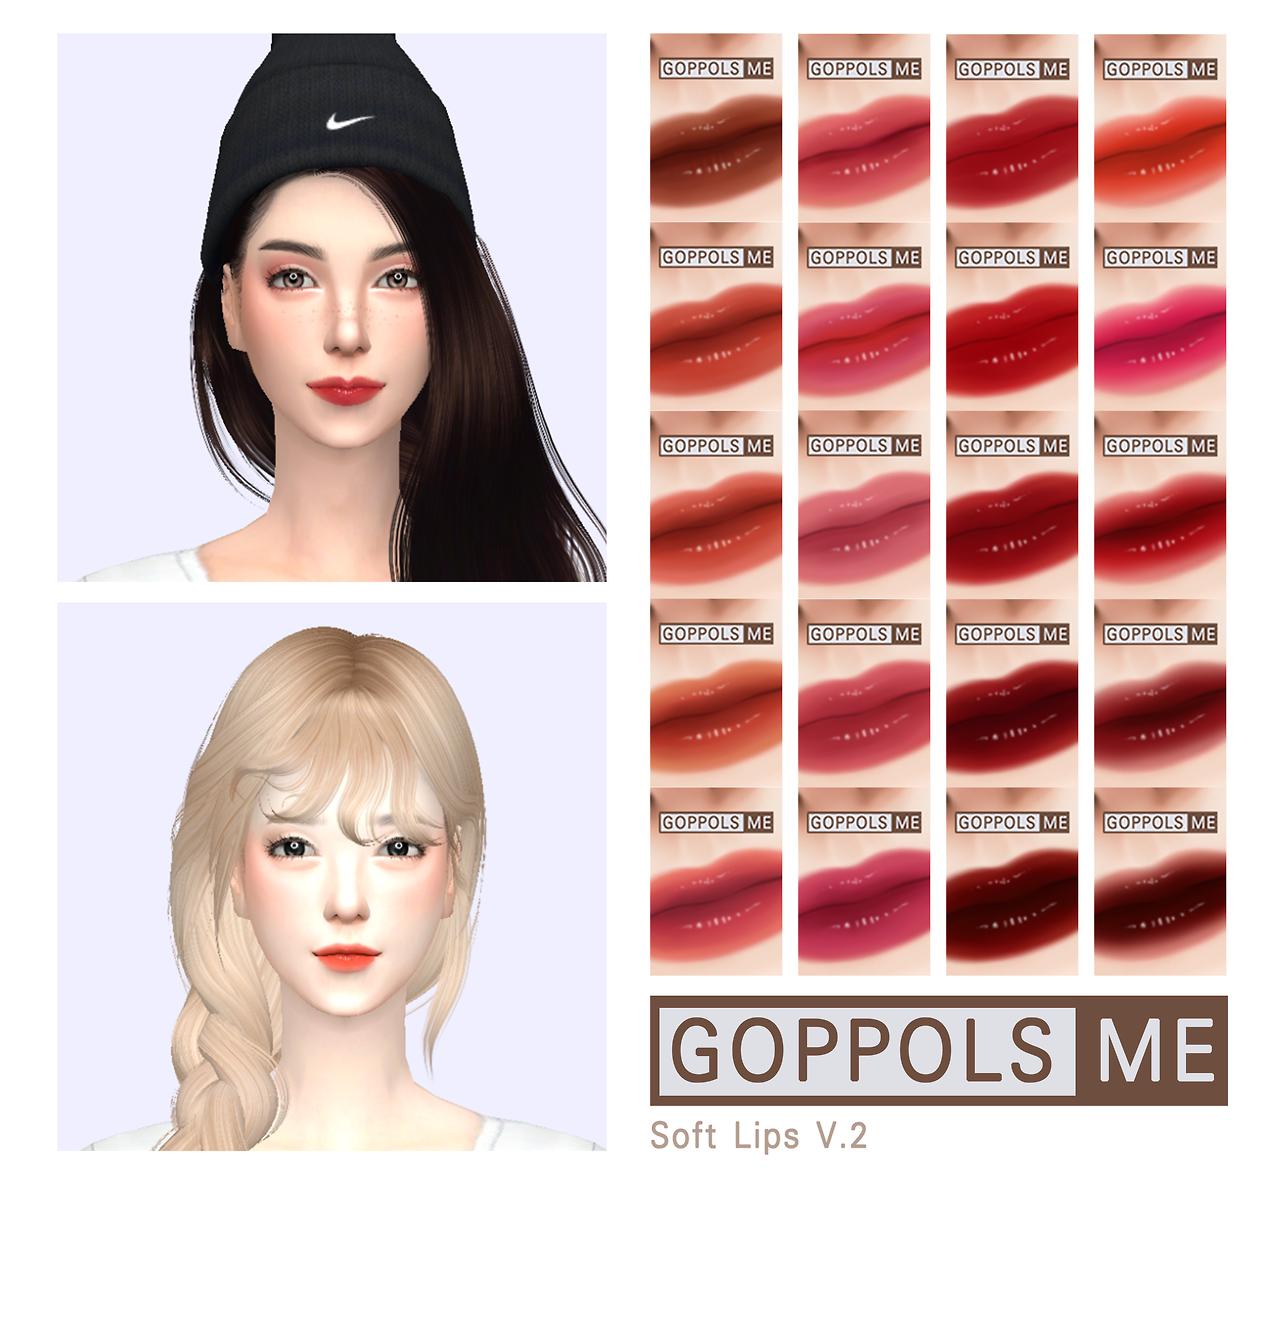 Soft Lips V.2 Download Soft Lips V2 เดอะ ซิมส์, ซิมส์